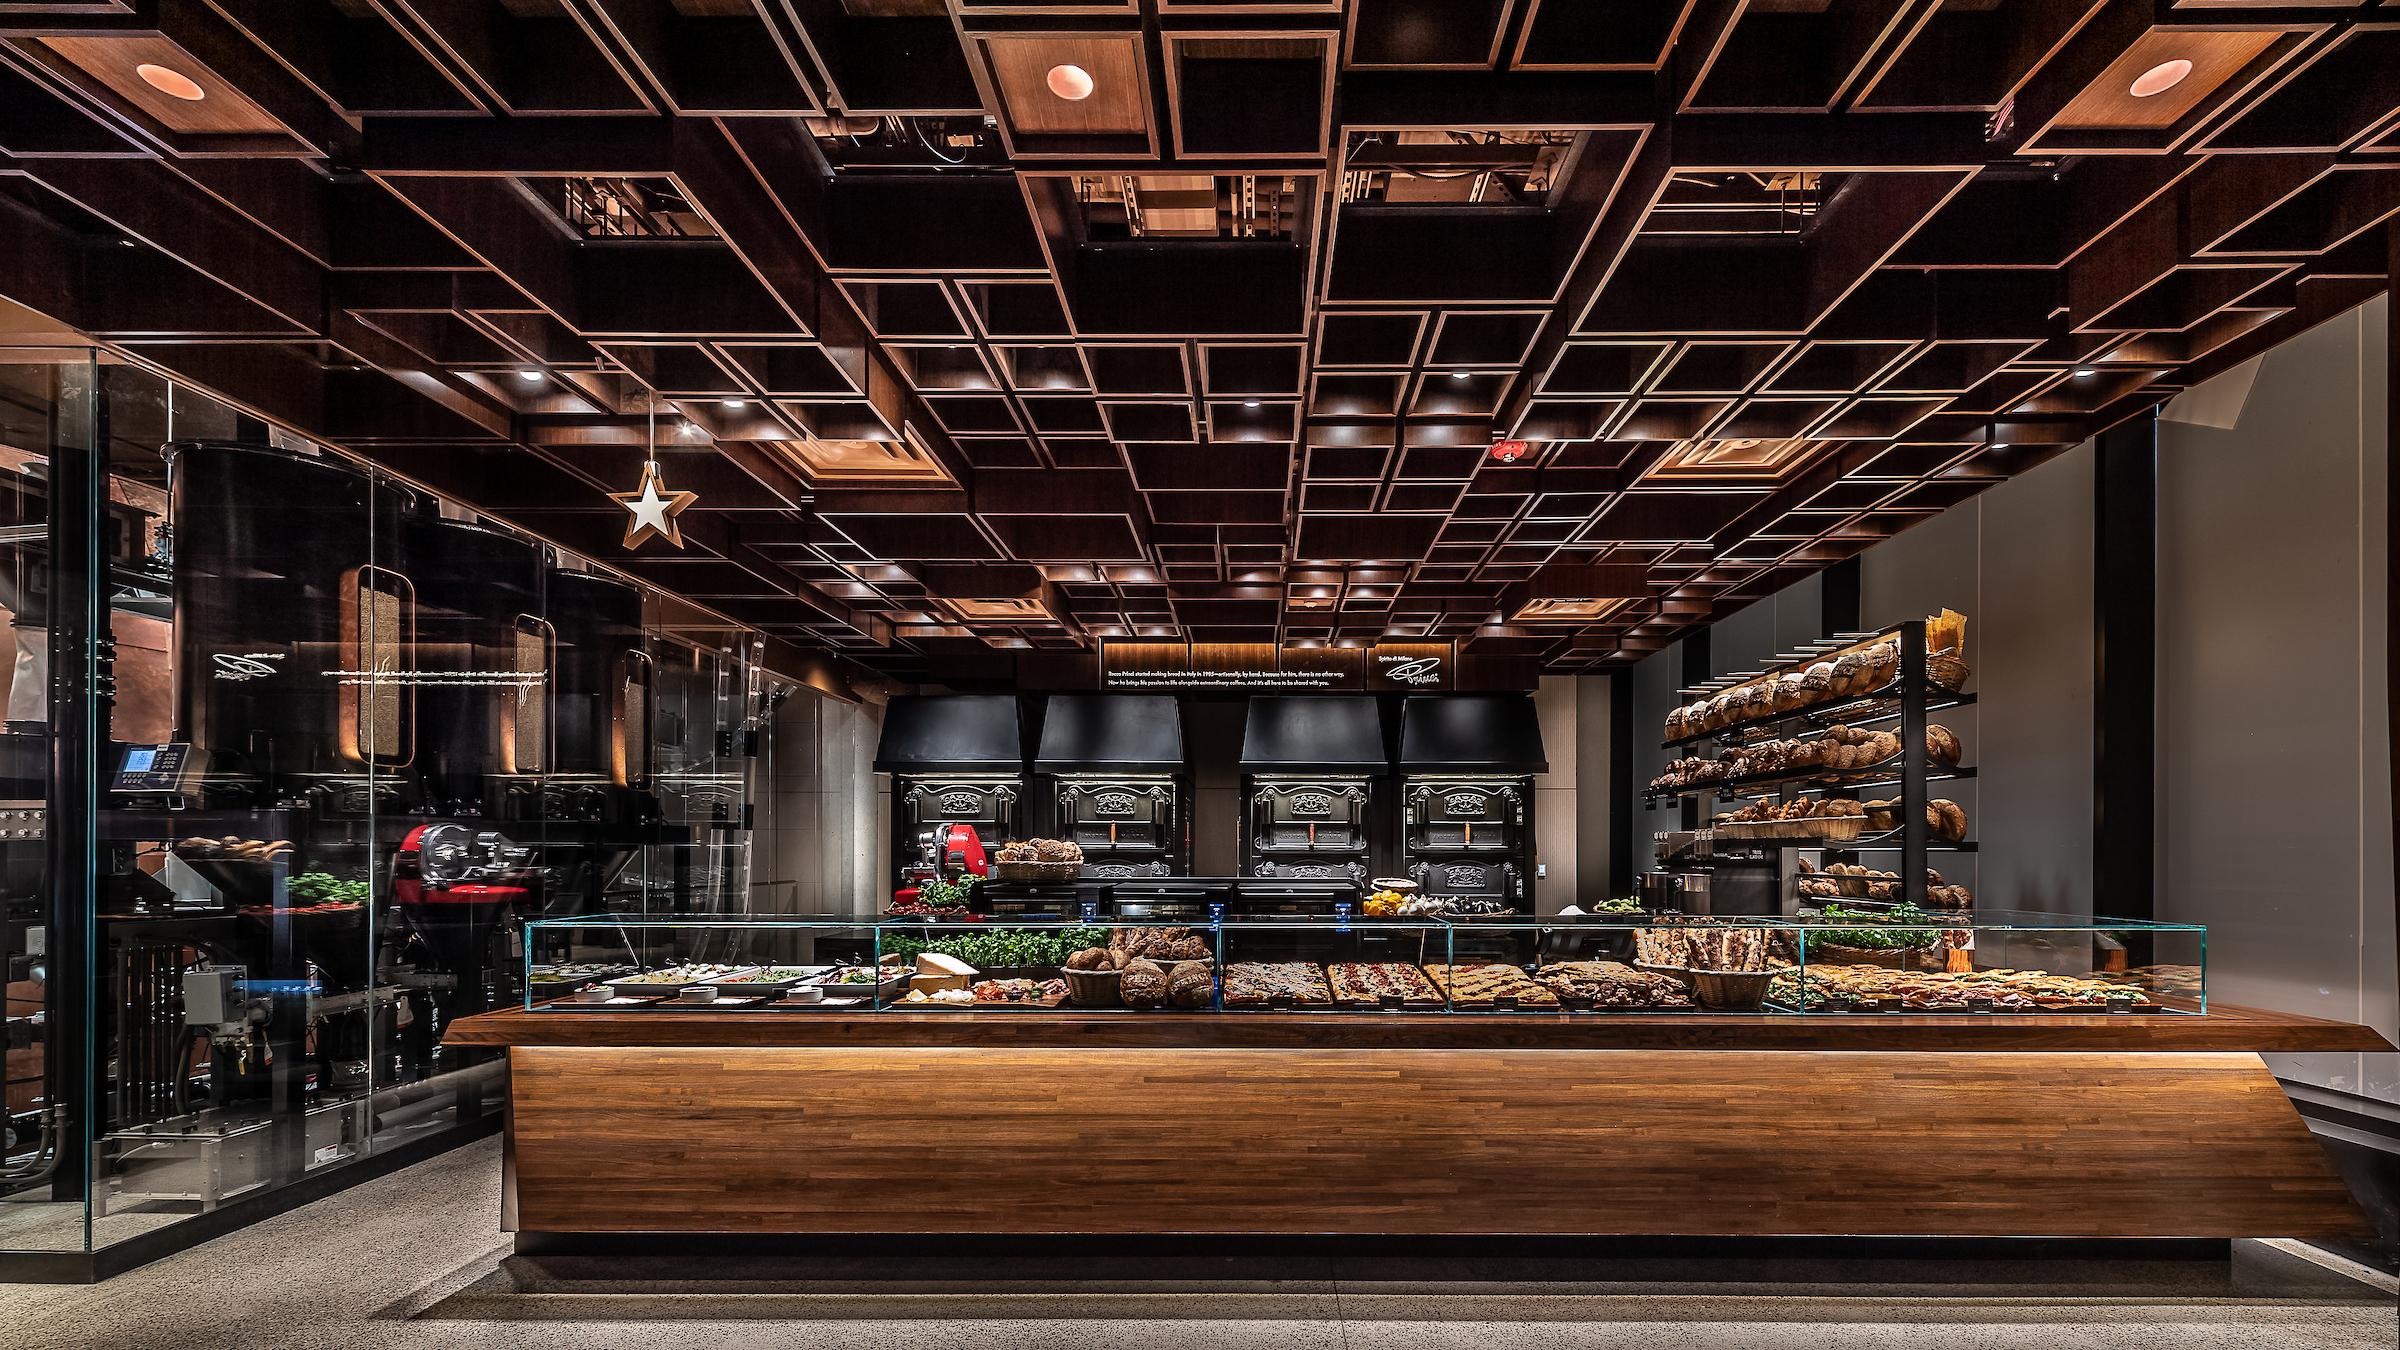 New Starbucks Reserve Roastery Debuts In New York 2018 12